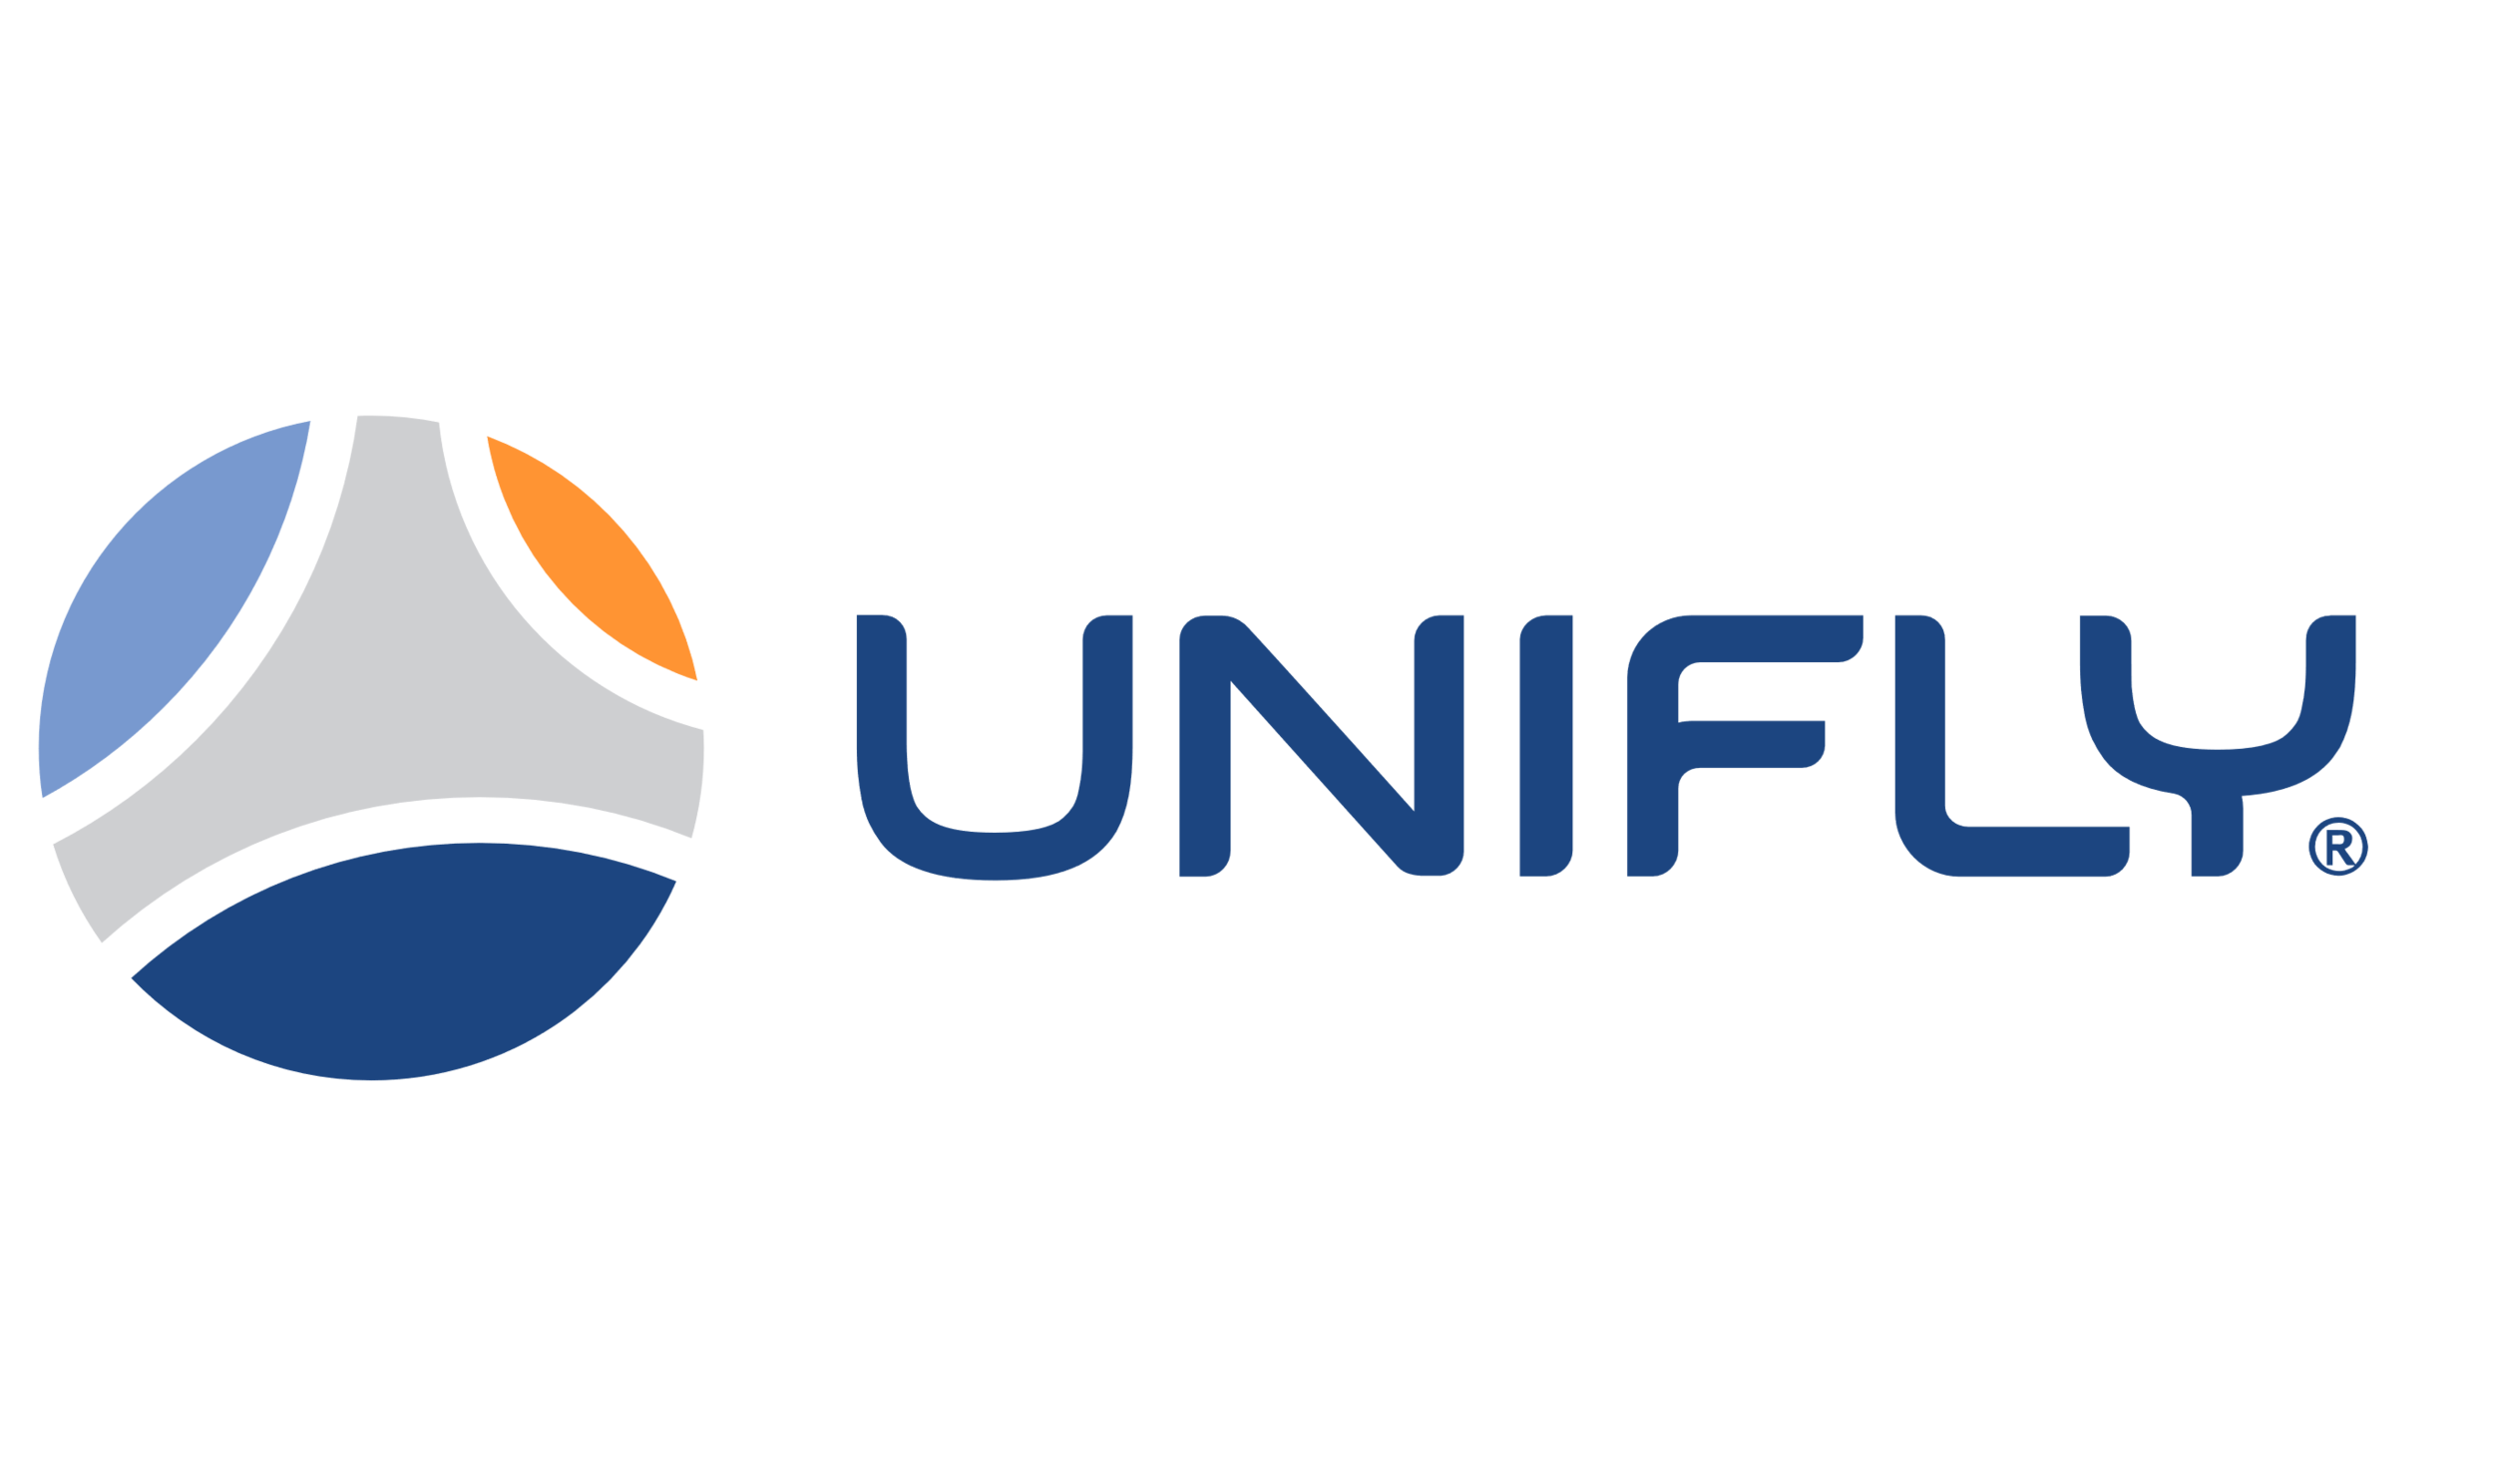 logo-unifly-logo.png